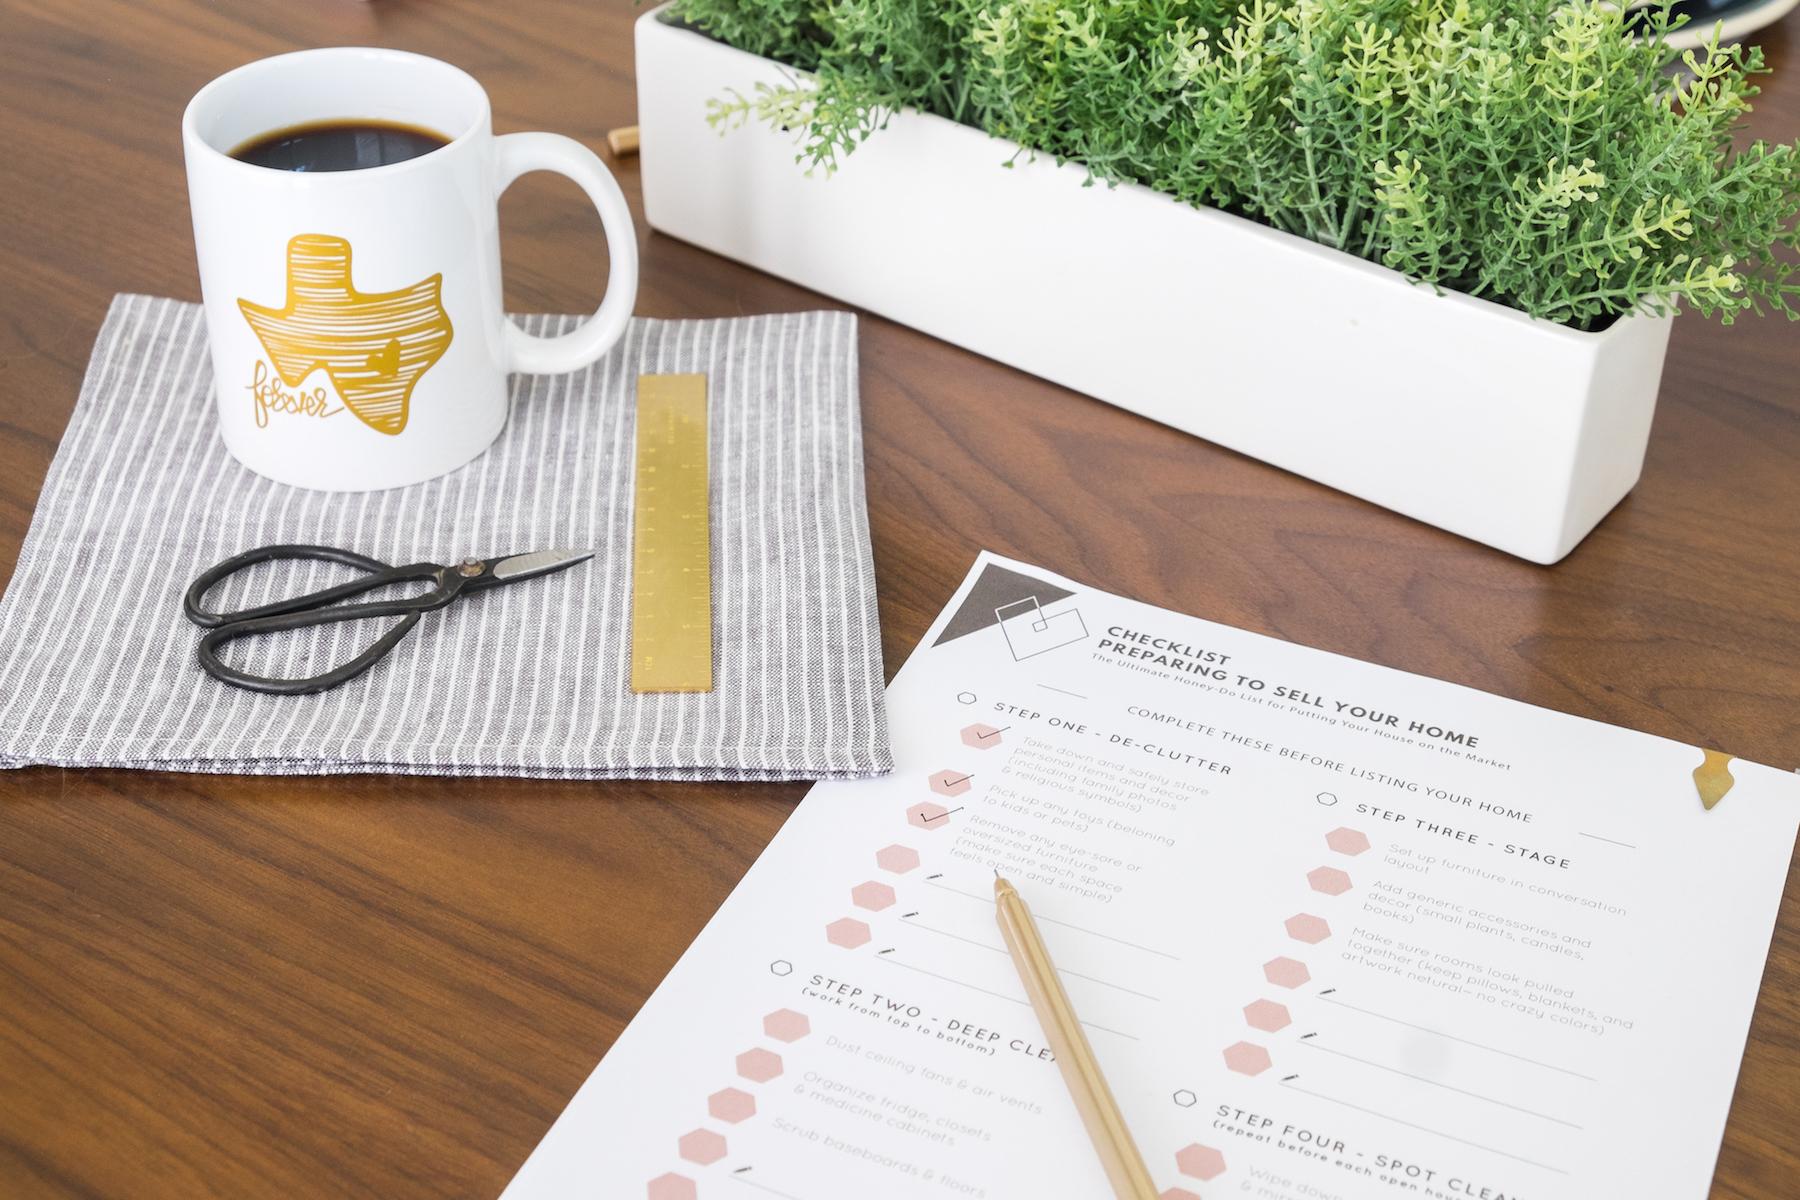 LoveDing-Blog-Austin-Staging-Checklist-for-Preparing-to-Sell-Your-Home.jpg